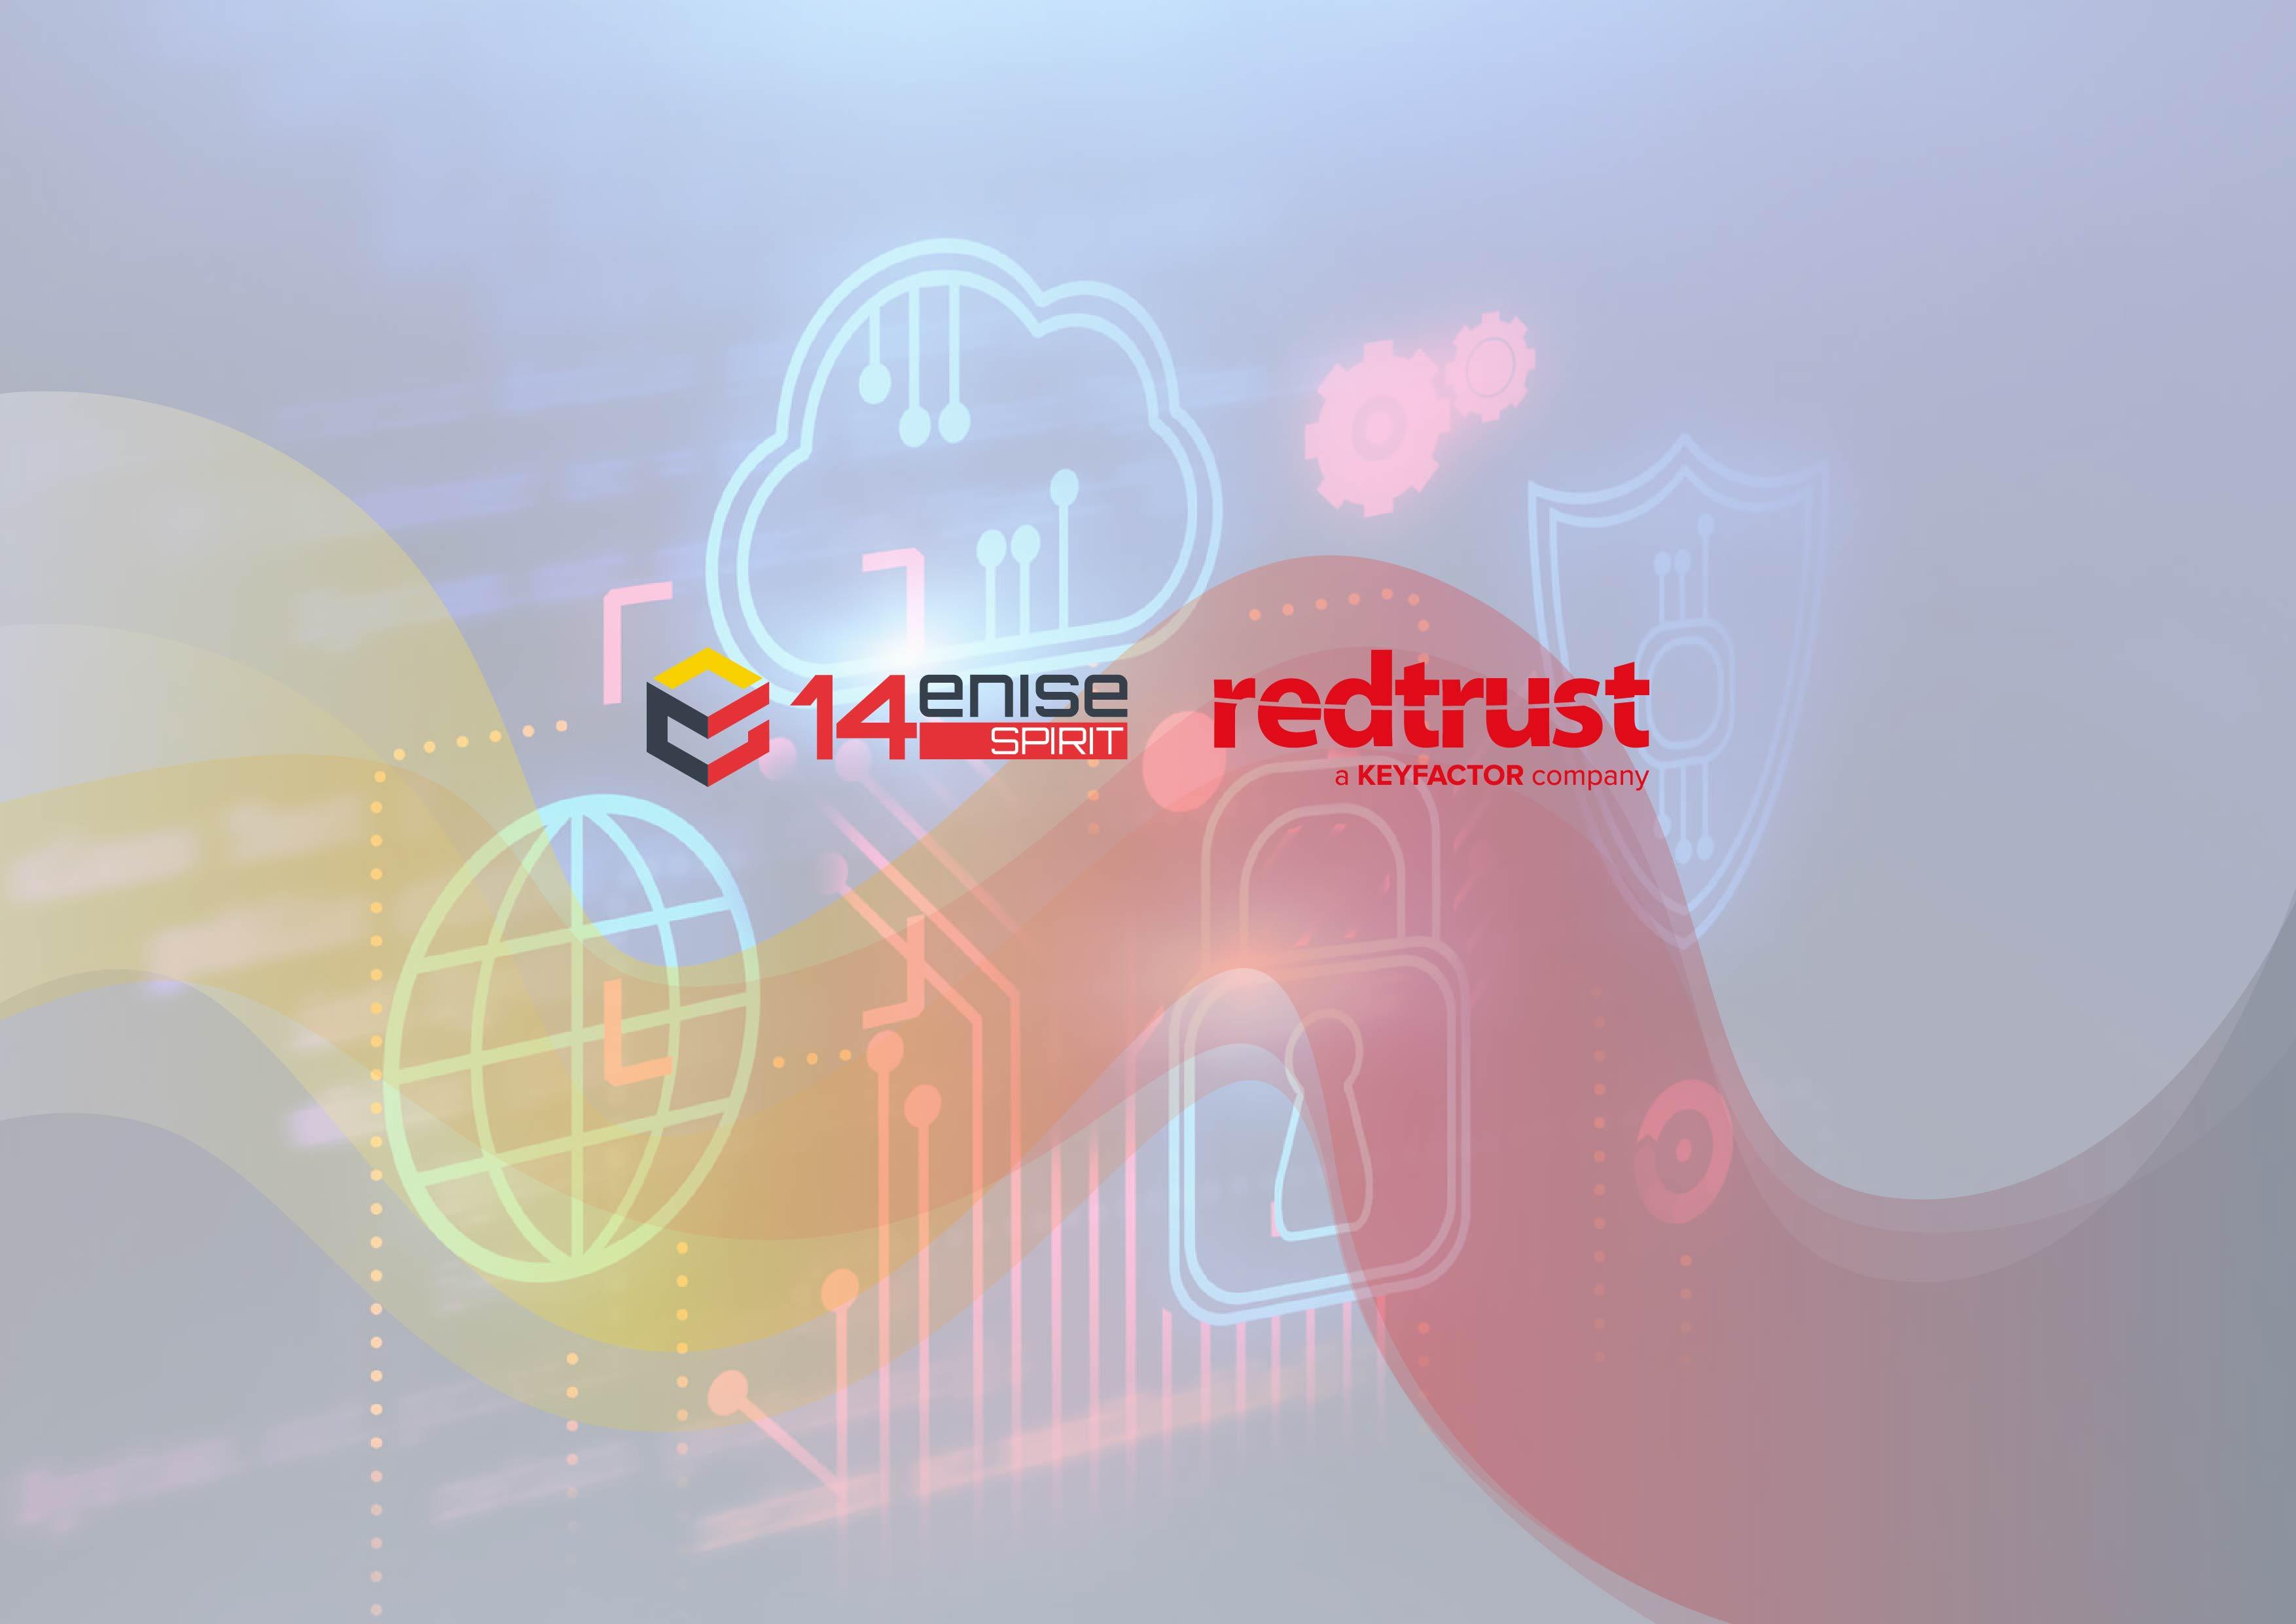 cabecera-resumen-14enise-redtrust